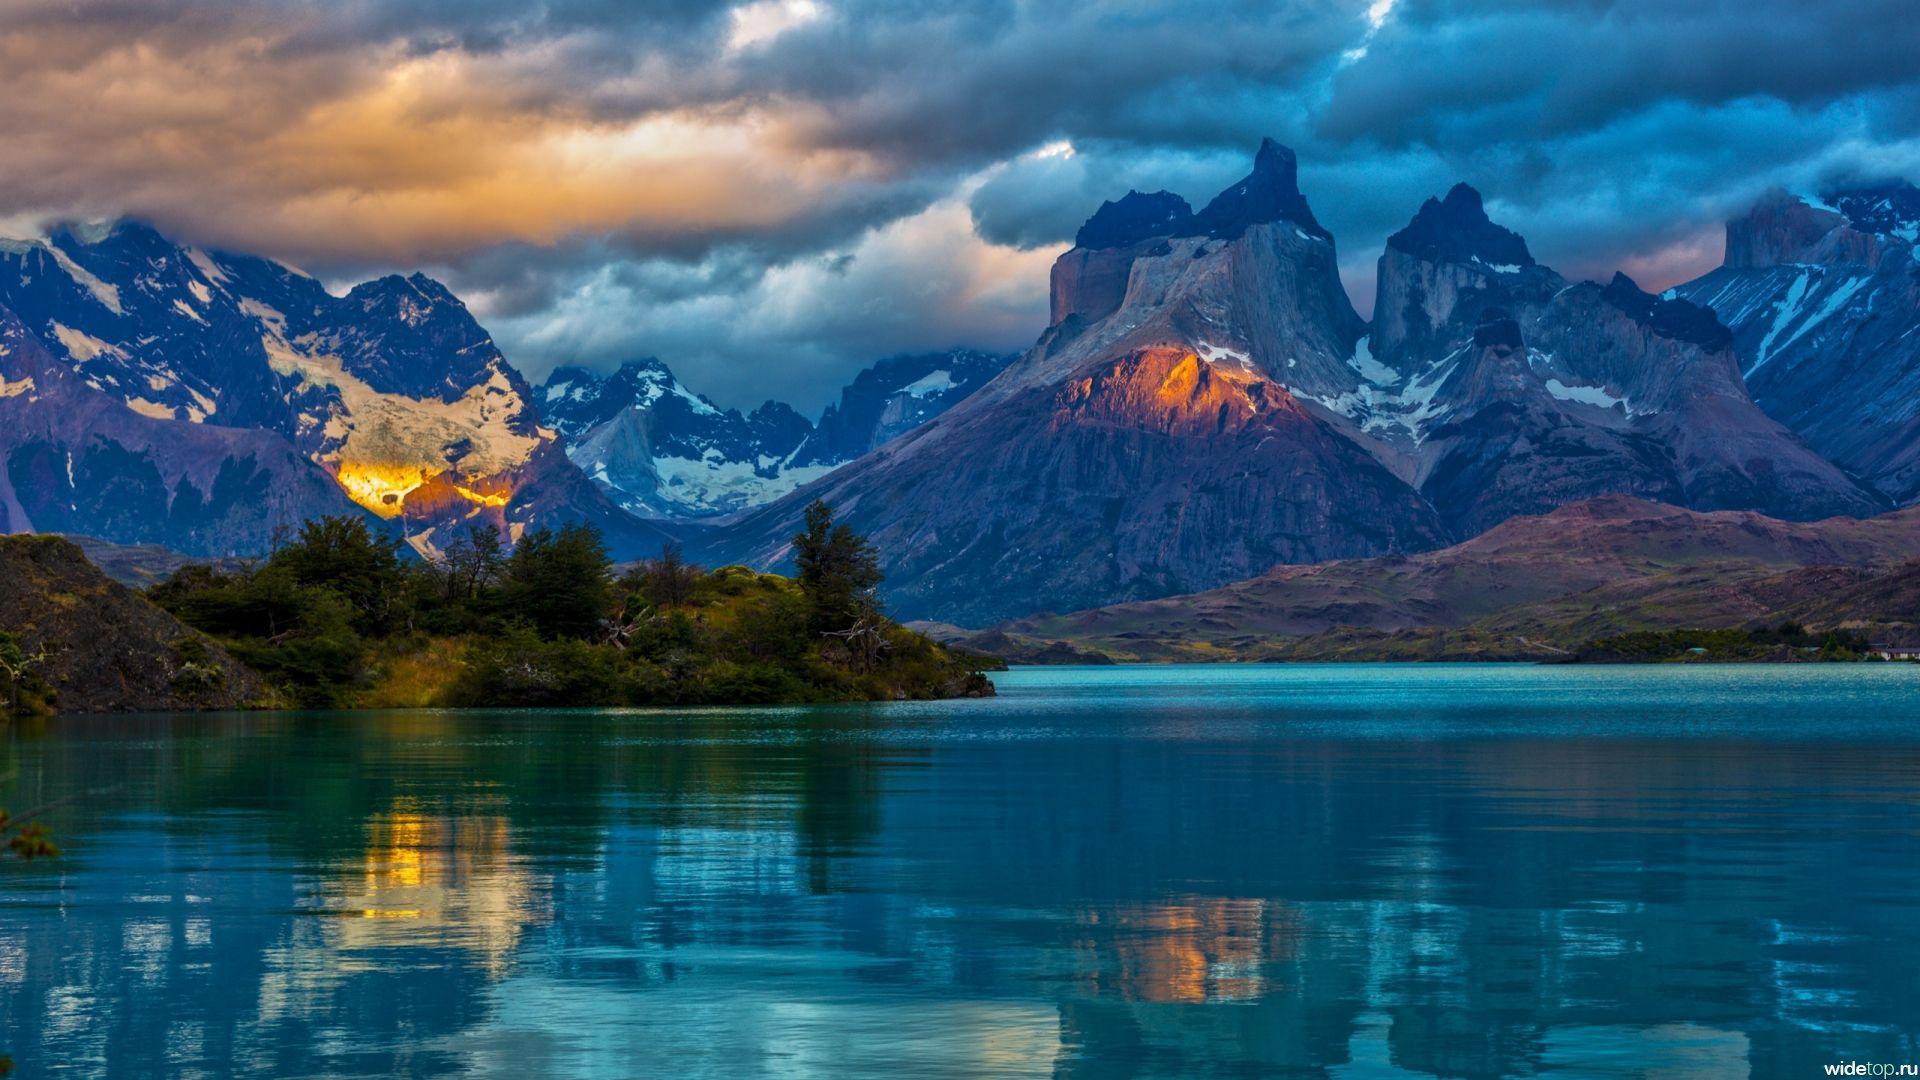 Hd Landscape Wallpapers Top Free Hd Landscape Backgrounds